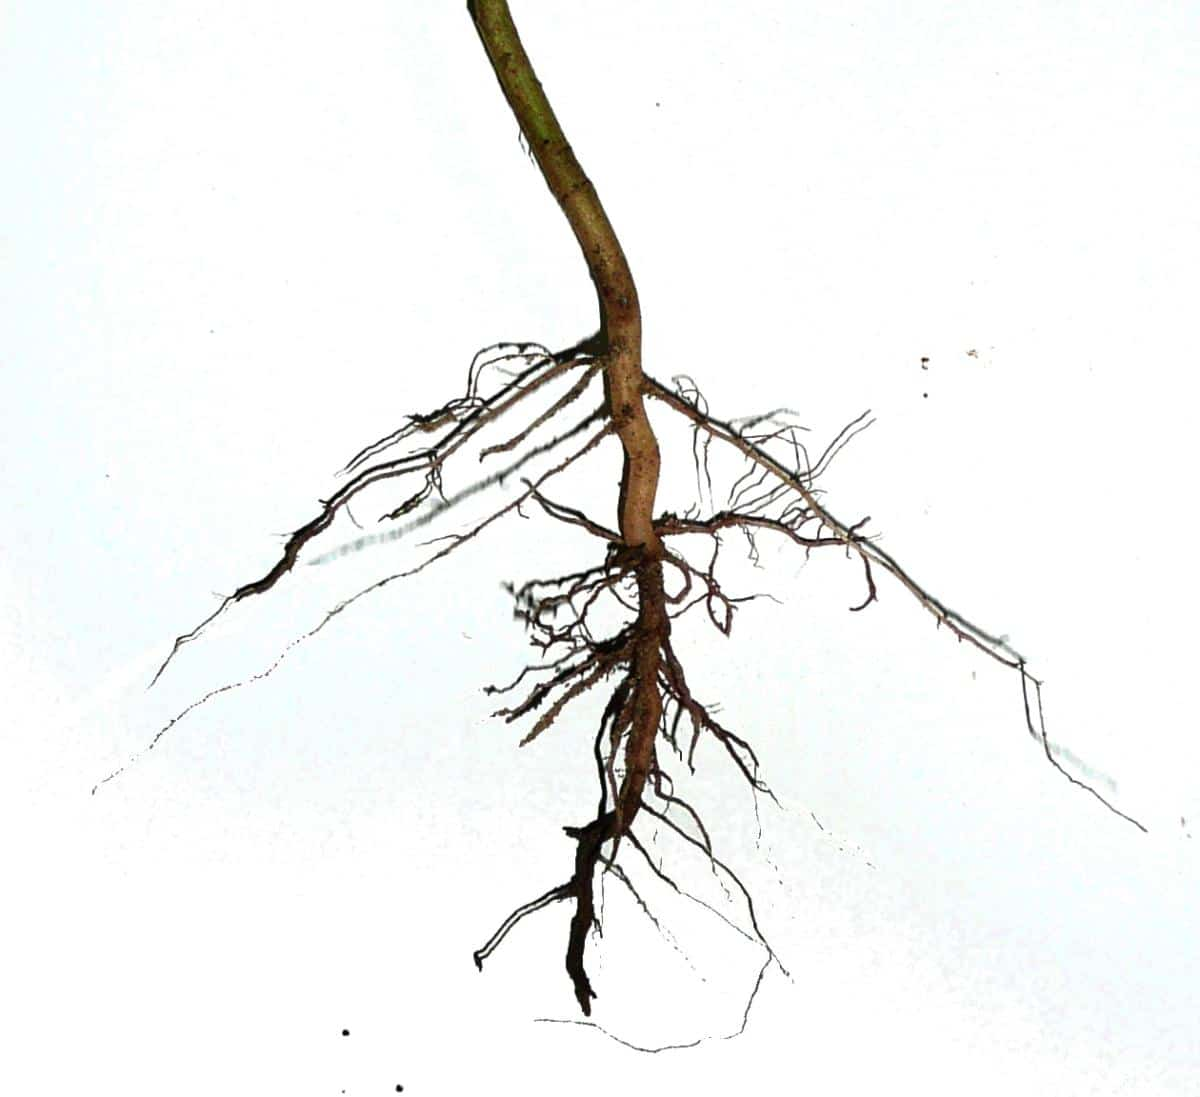 La raíz pivotante es gruesa y larga